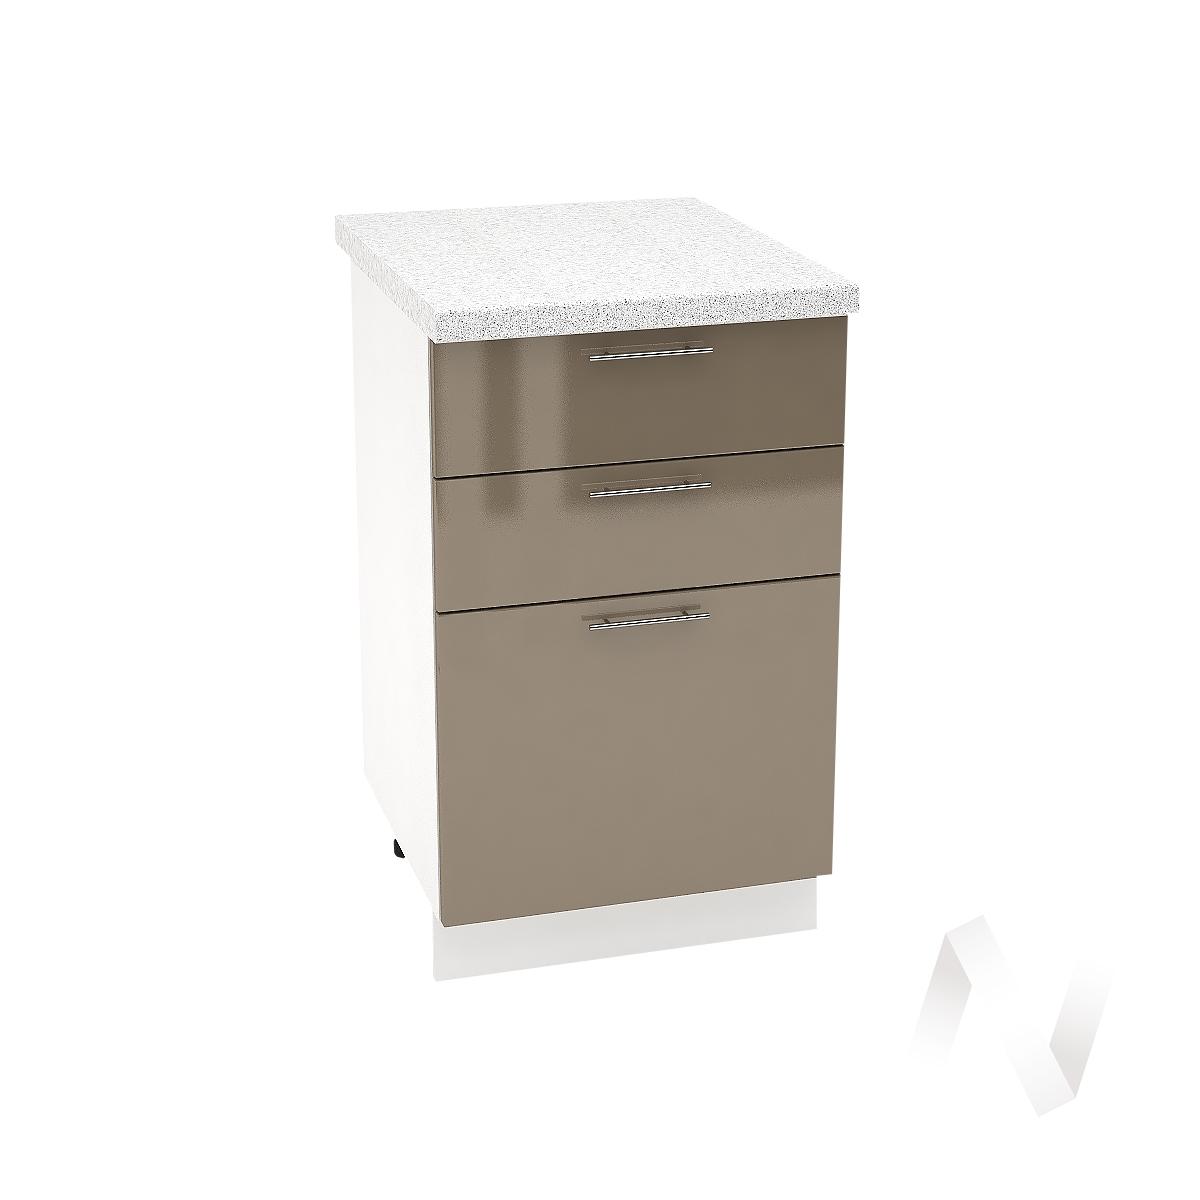 "Кухня ""Валерия-М"": Шкаф нижний с 3-мя ящиками 500, ШН3Я 500 (Капучино глянец/корпус белый)"